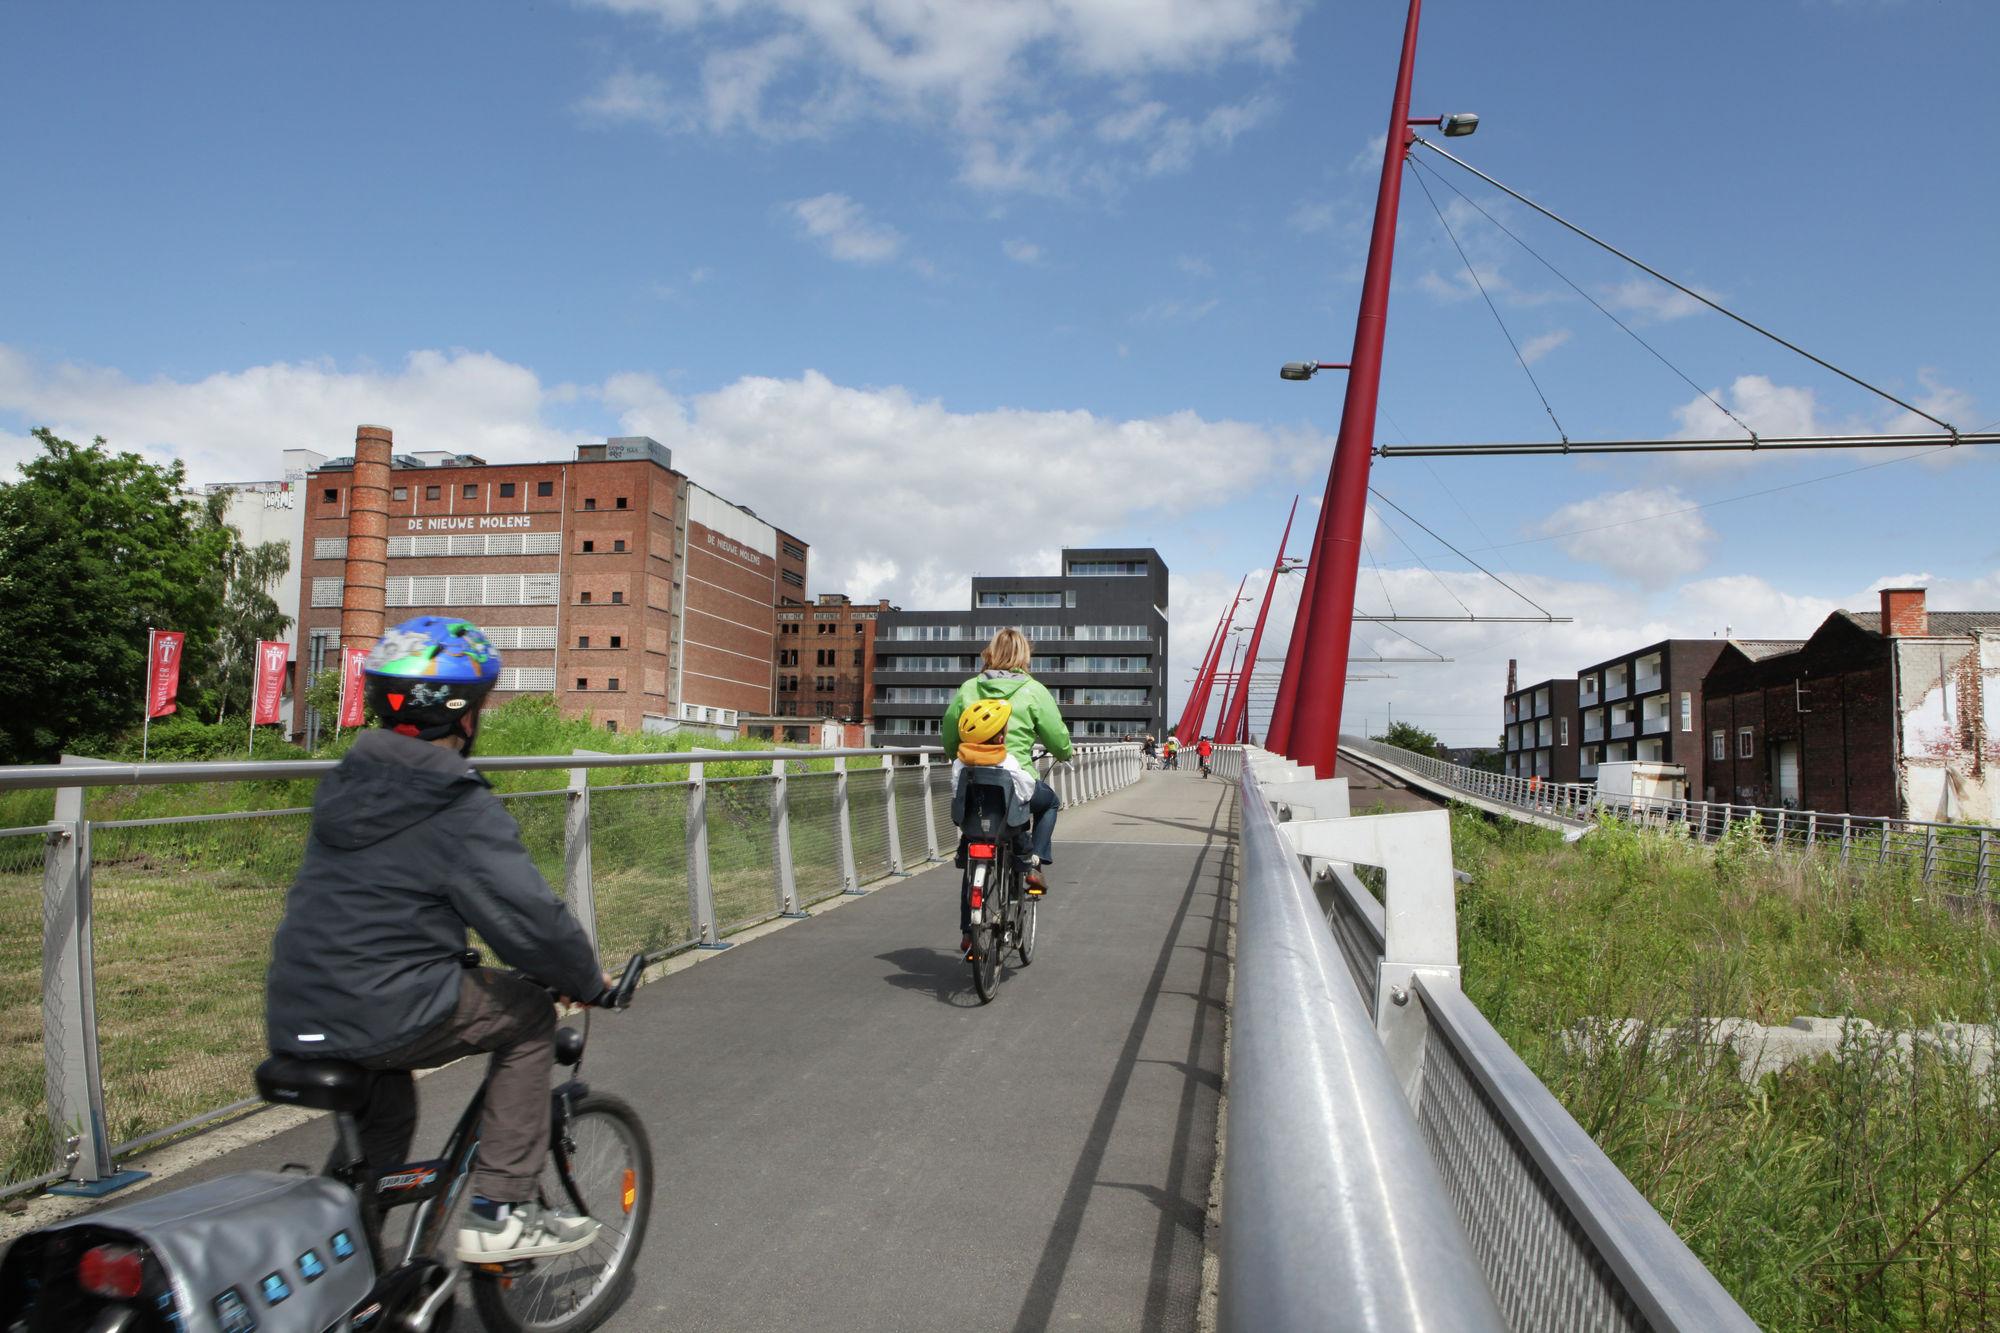 gaardeniersbrug en nieuwe molens (17)©Layla Aerts.jpg